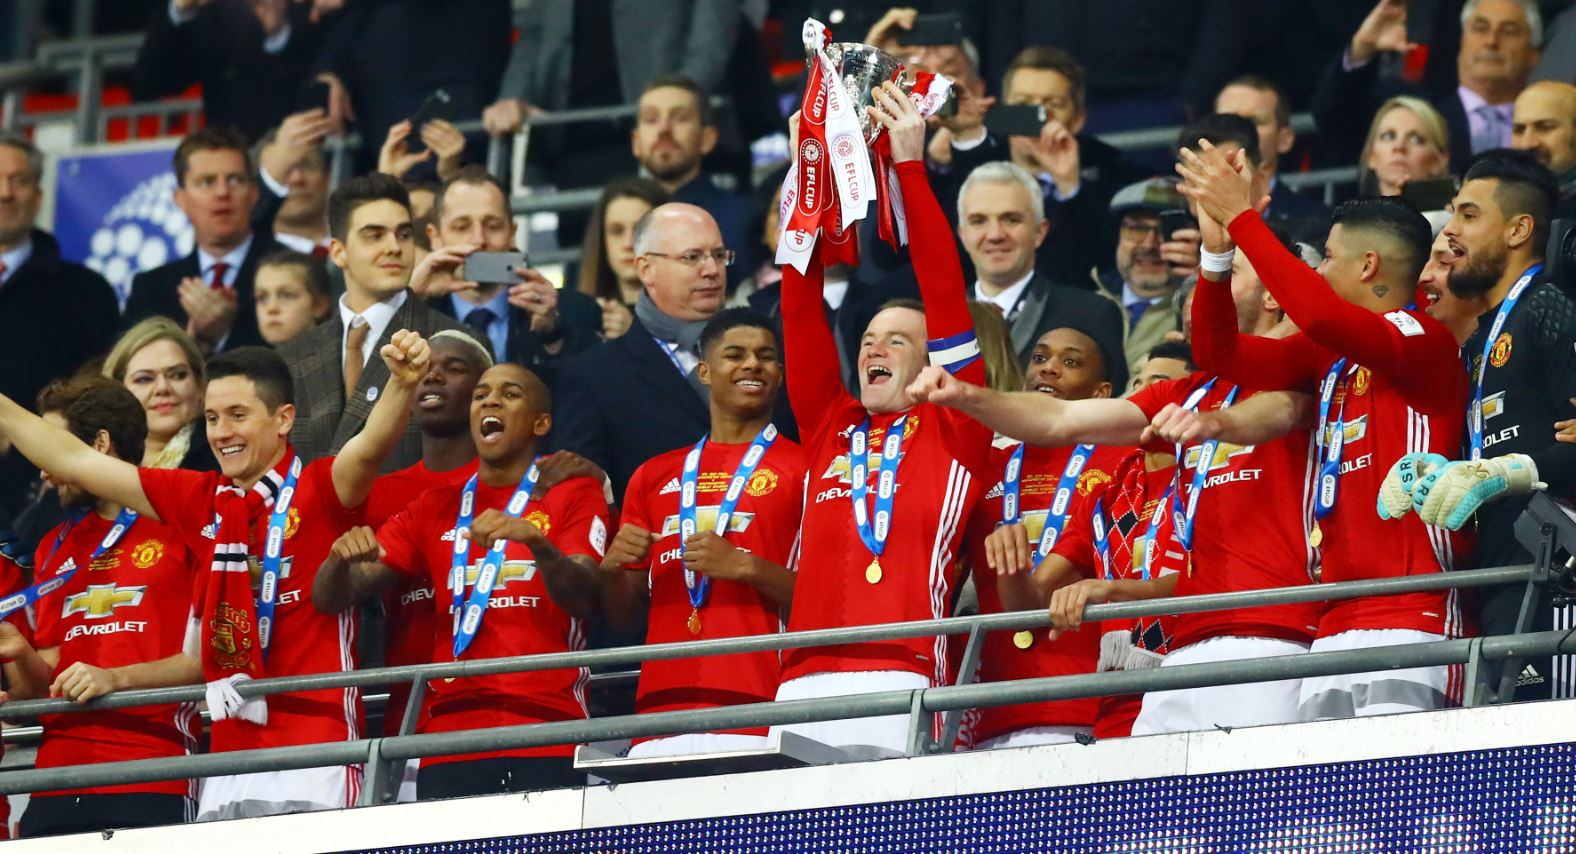 Zlatan Brace Earns Man Utd 2017 EFL Title